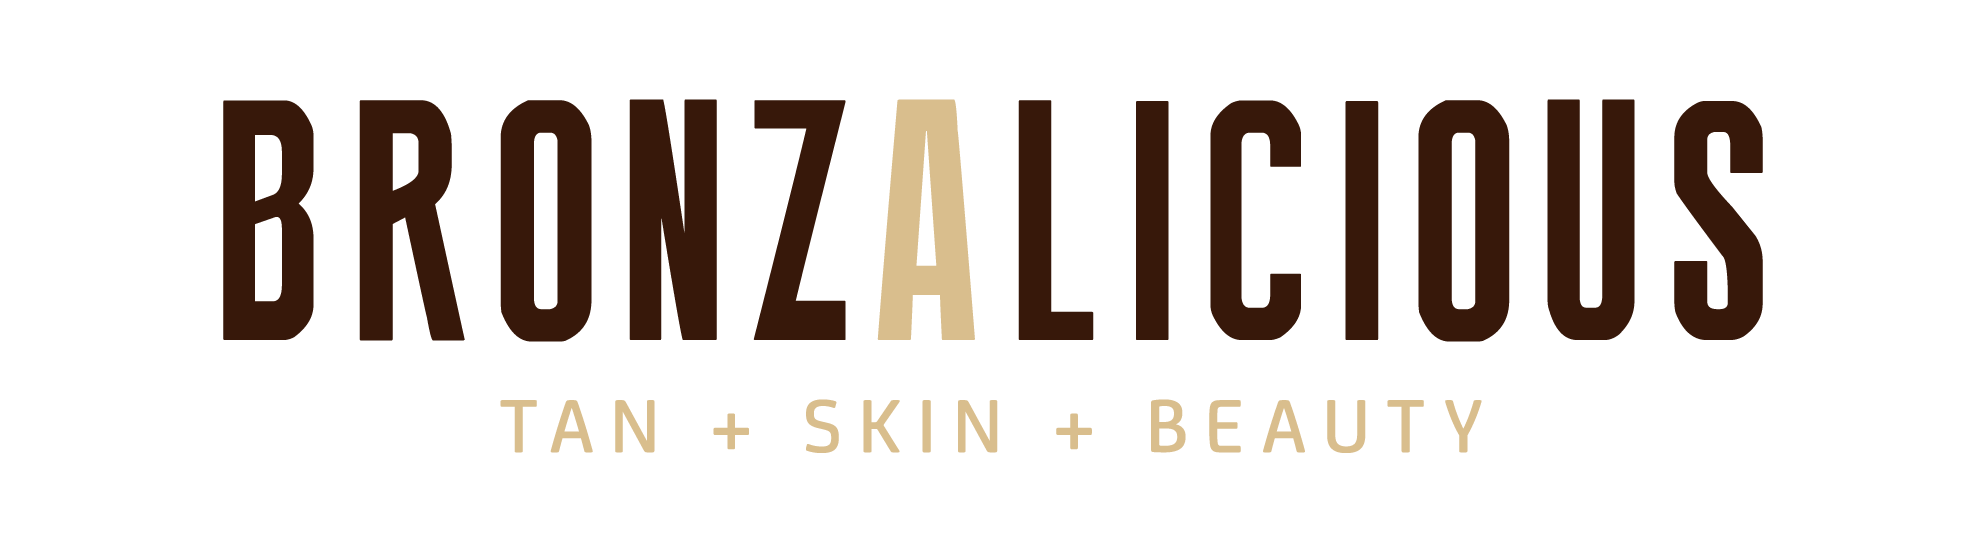 Bronzalicious